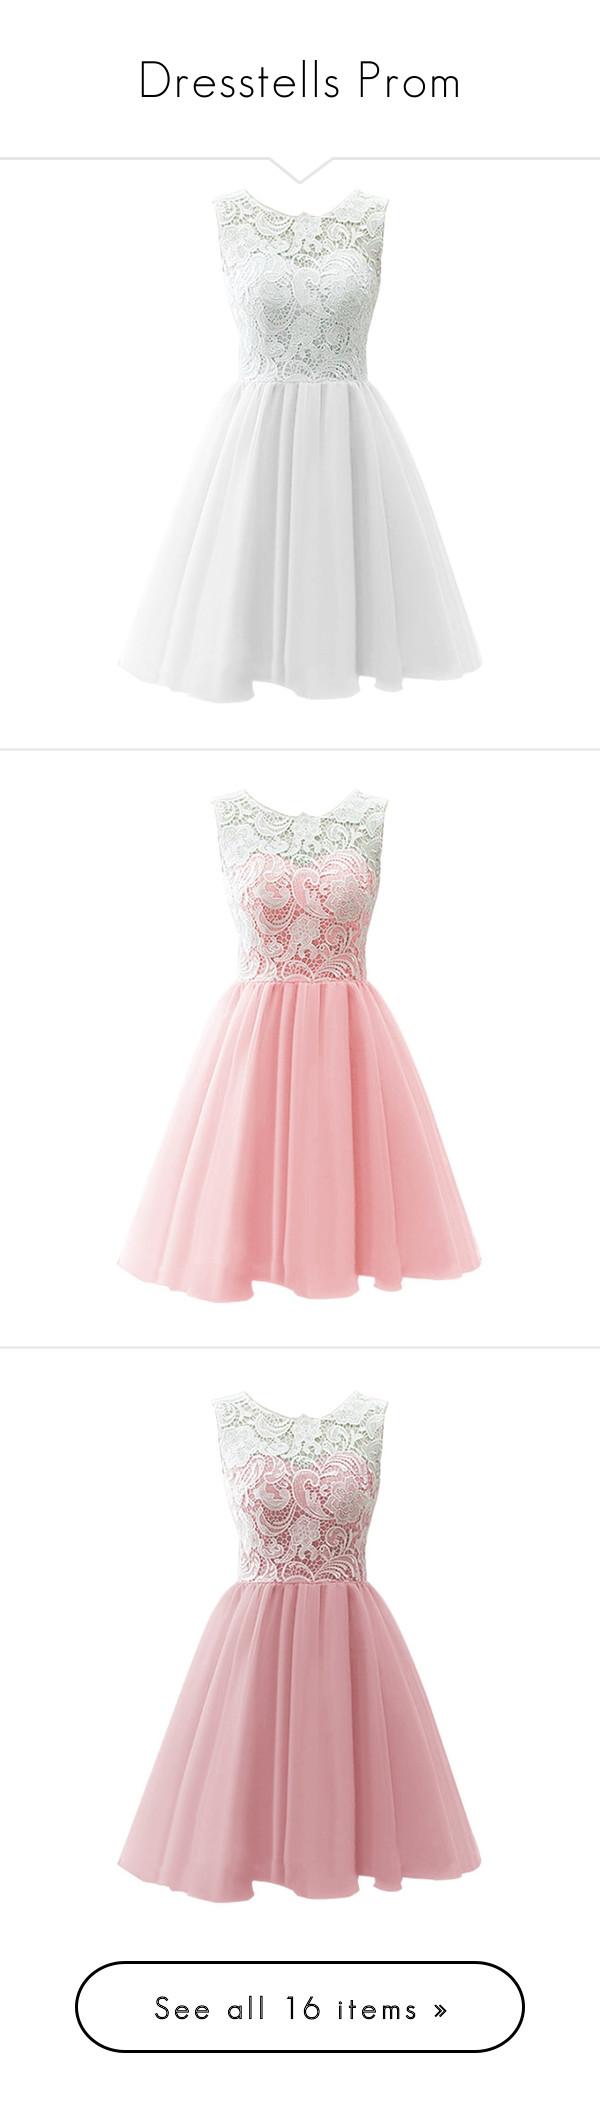 Dresstells Prom\